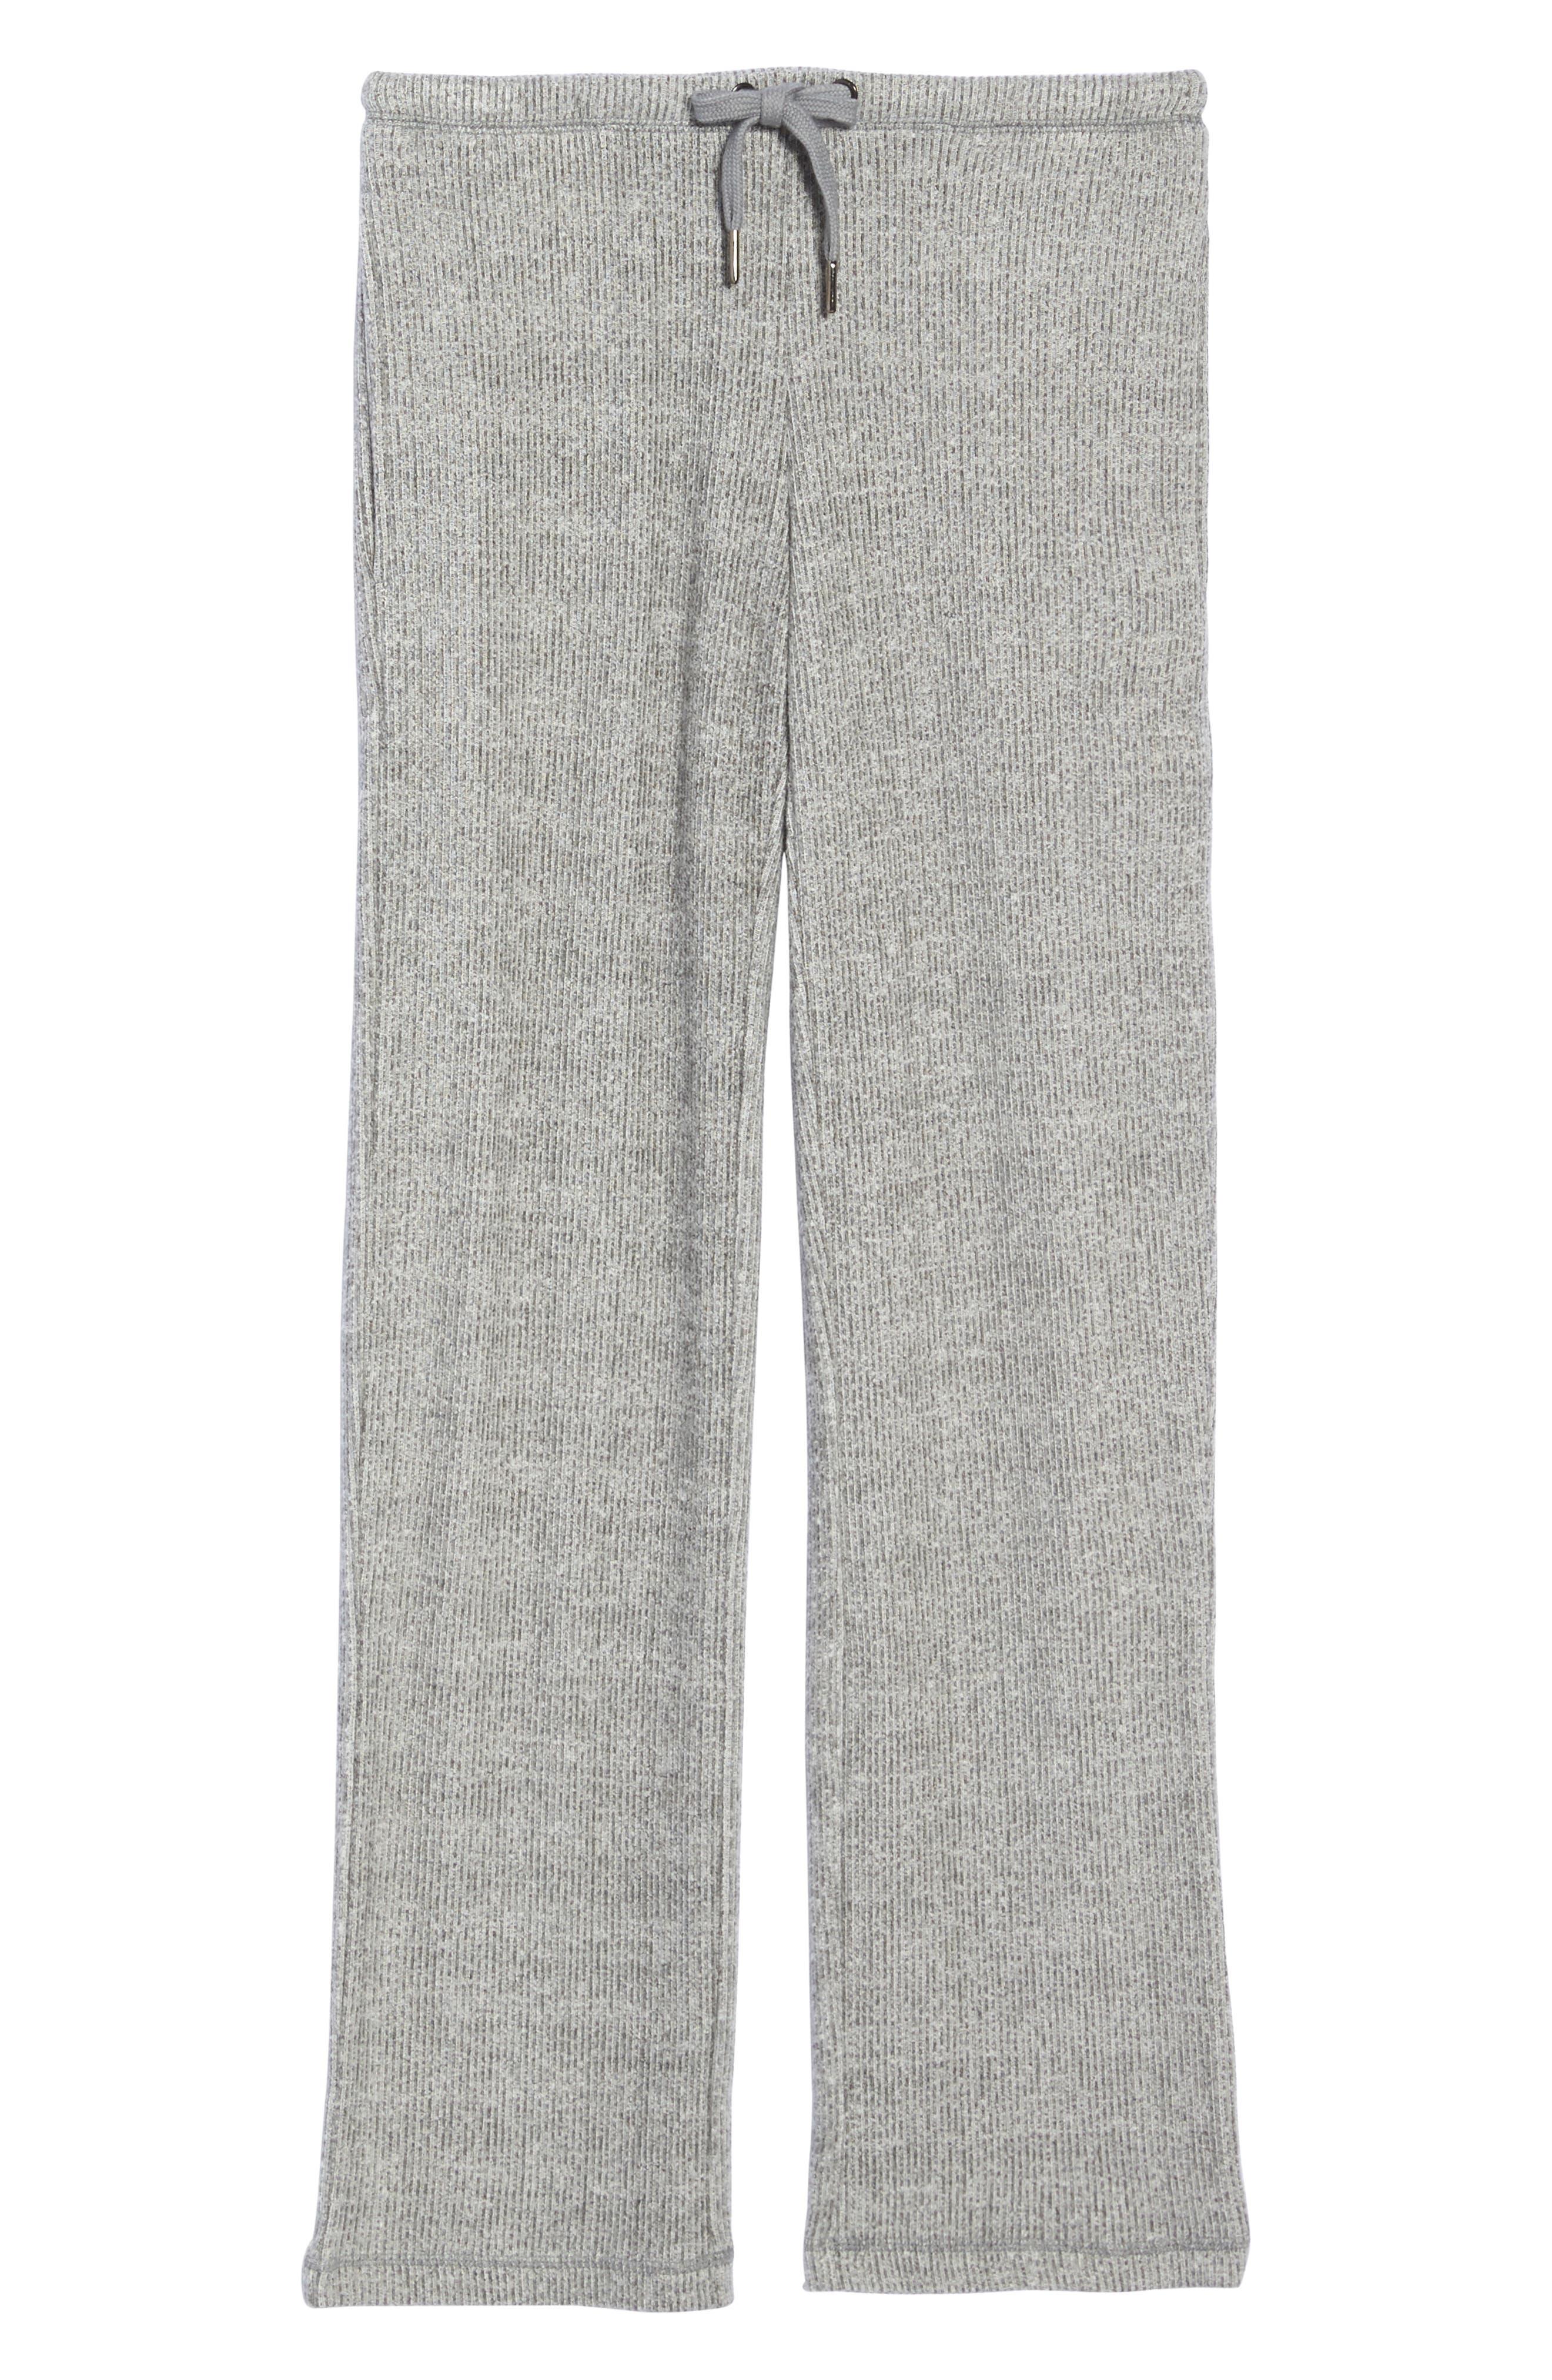 Knit Lounge Pants,                             Alternate thumbnail 4, color,                             Grey